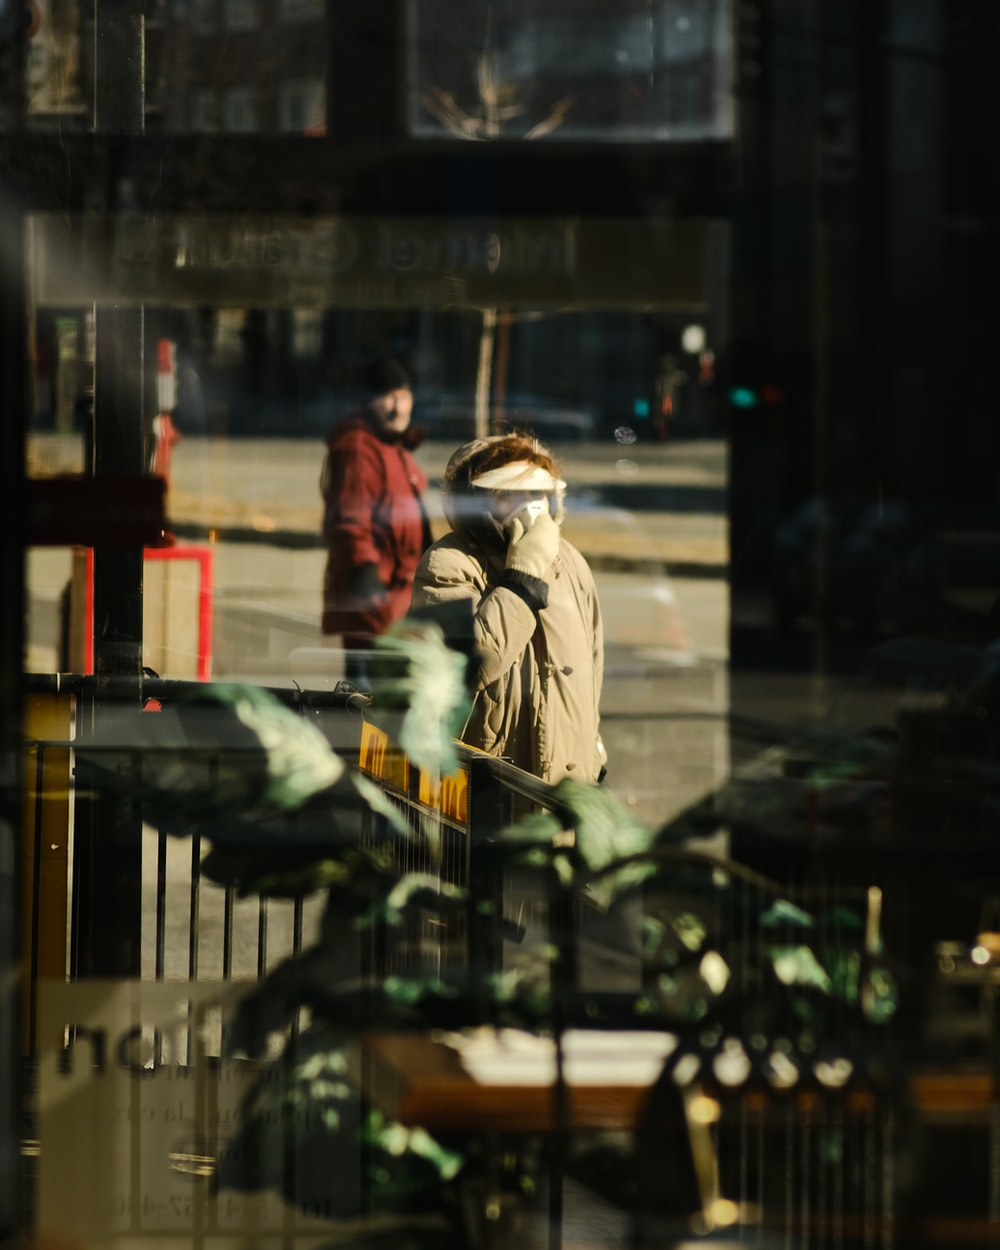 woman in brown coat standing in front of glass window